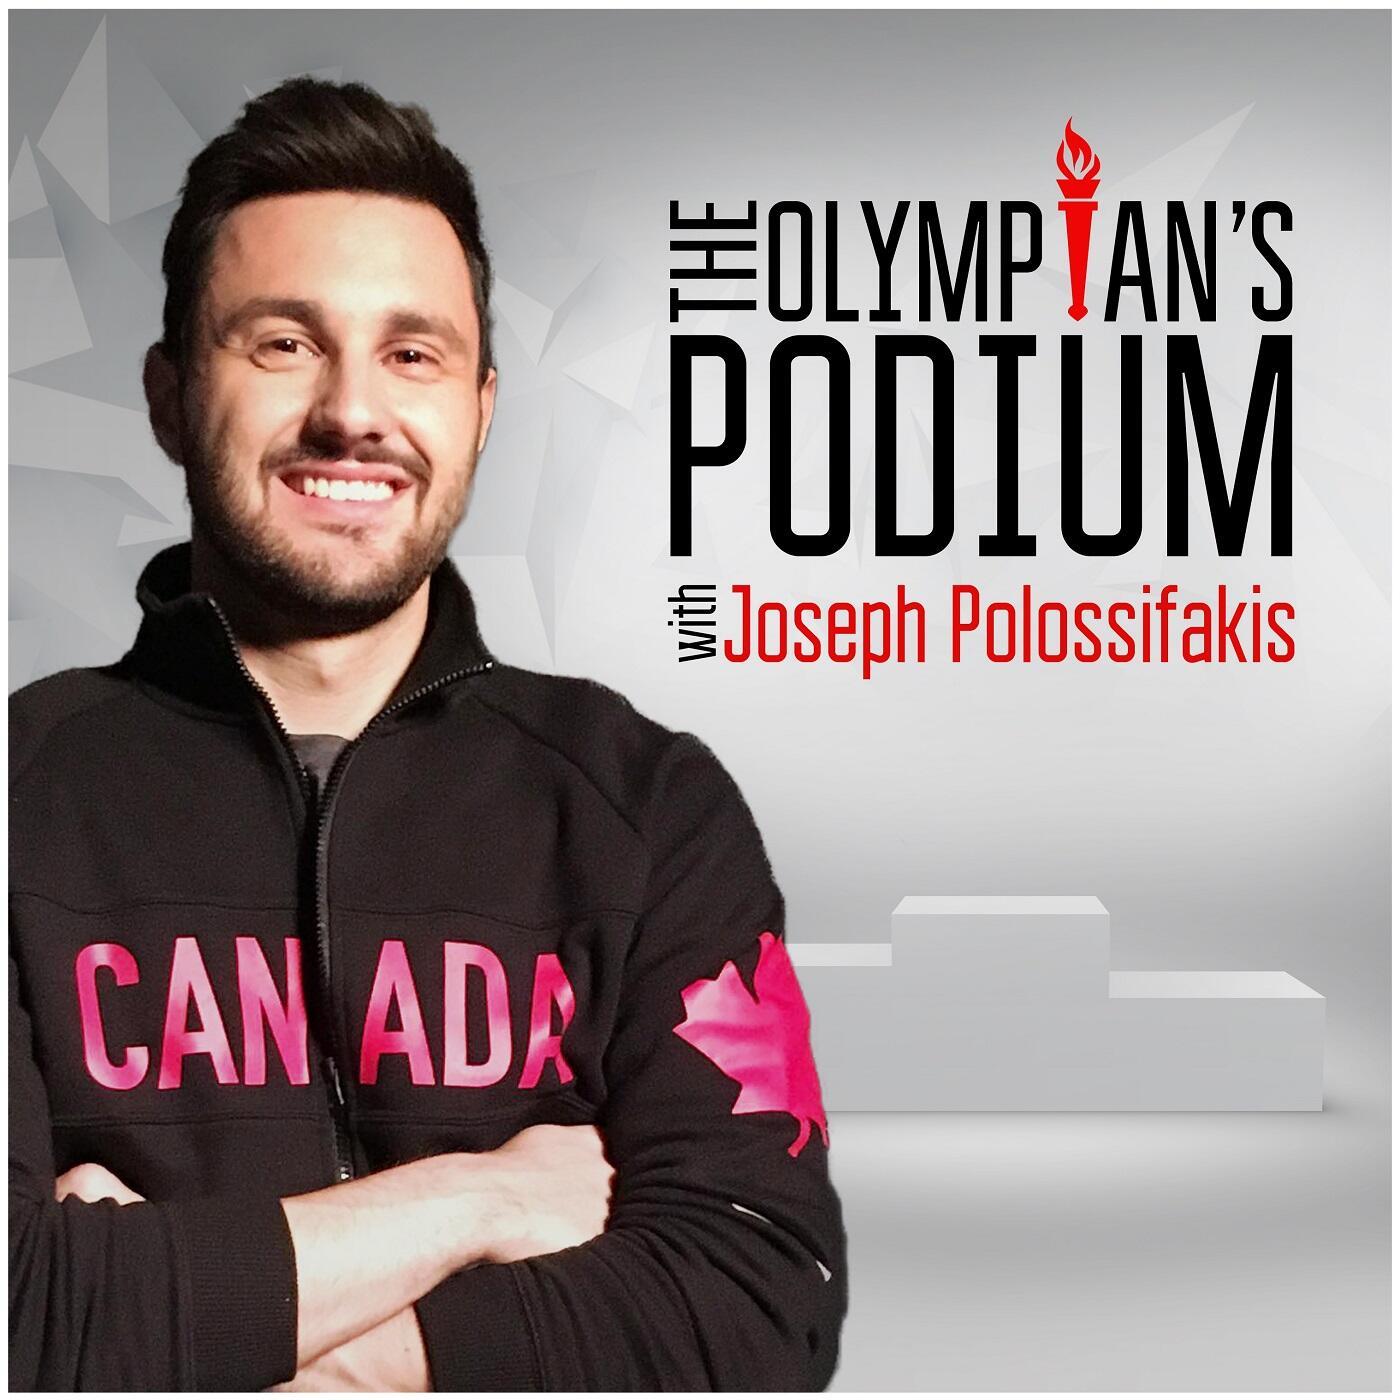 The Olympian's Podium